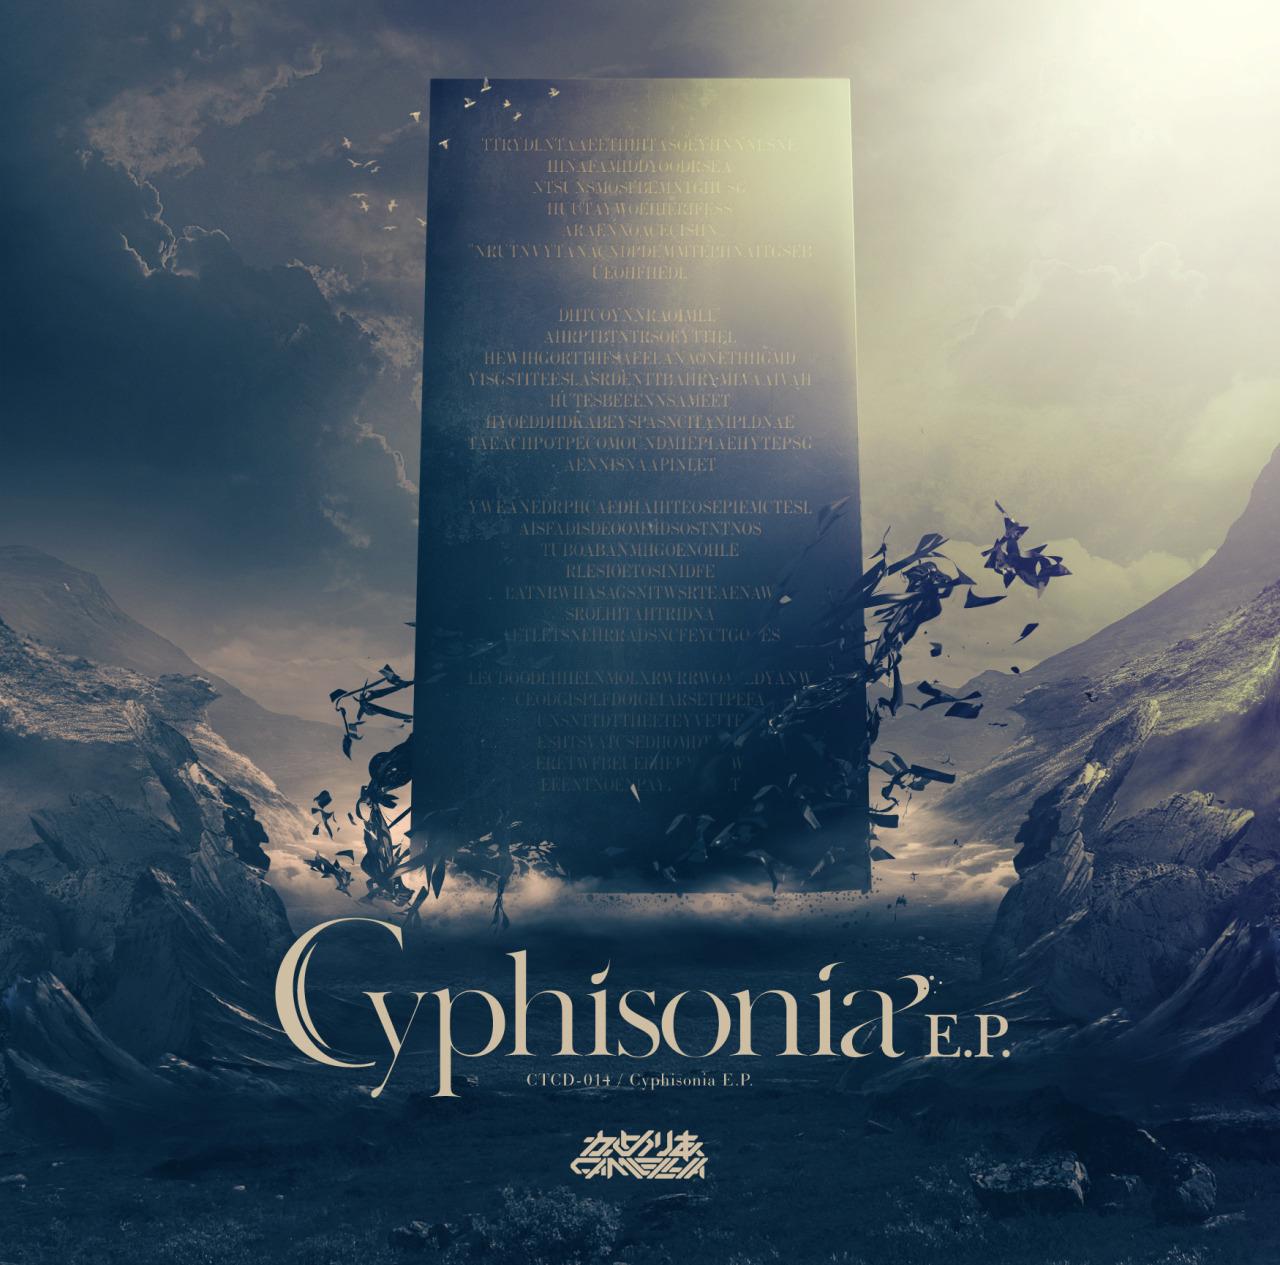 Cyphisonia E.P.